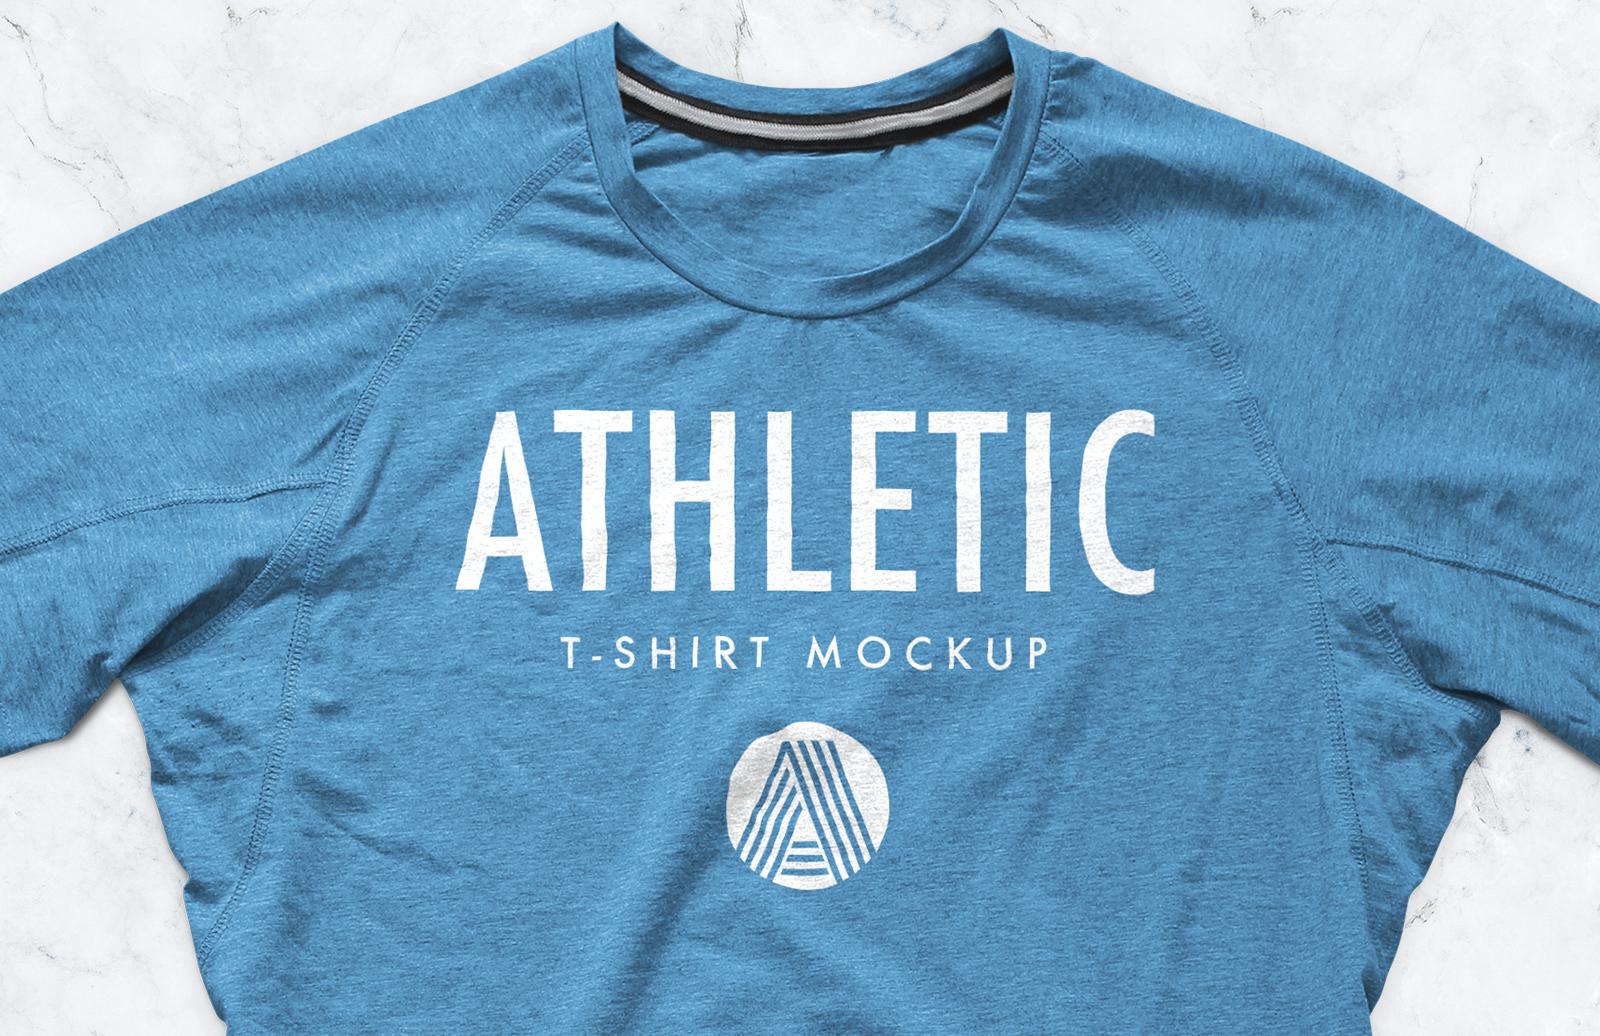 athletic t shirt mockup psd medialoot